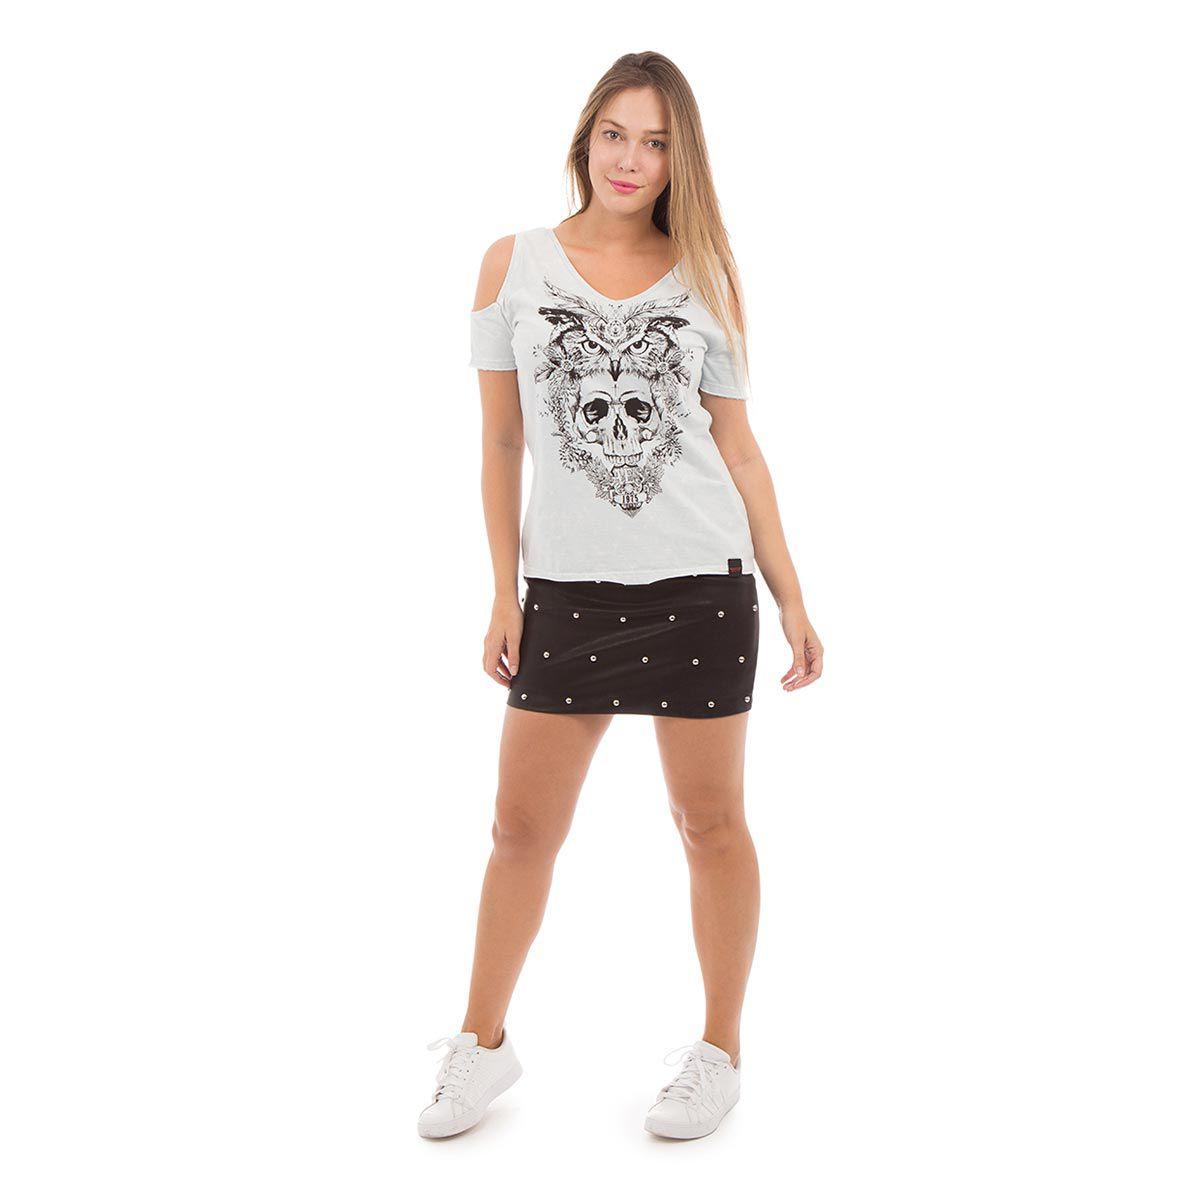 Camiseta AES 1975 Owl and Skull